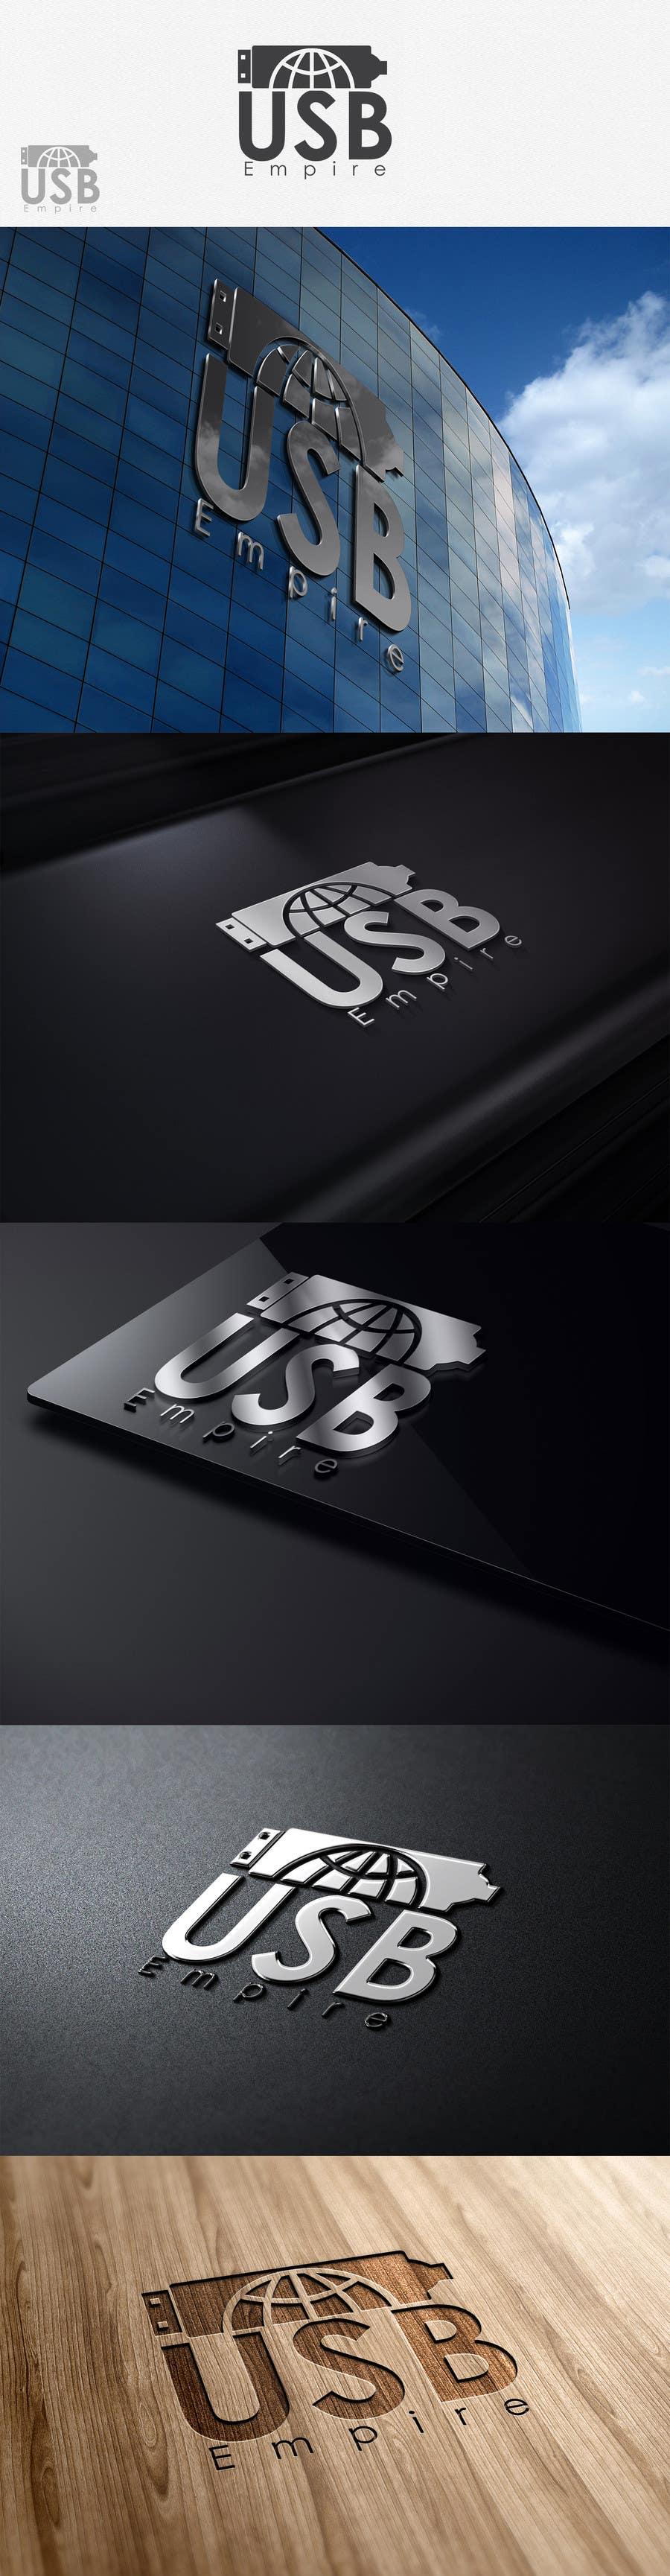 Konkurrenceindlæg #                                        101                                      for                                         Logo Design for USB Empire